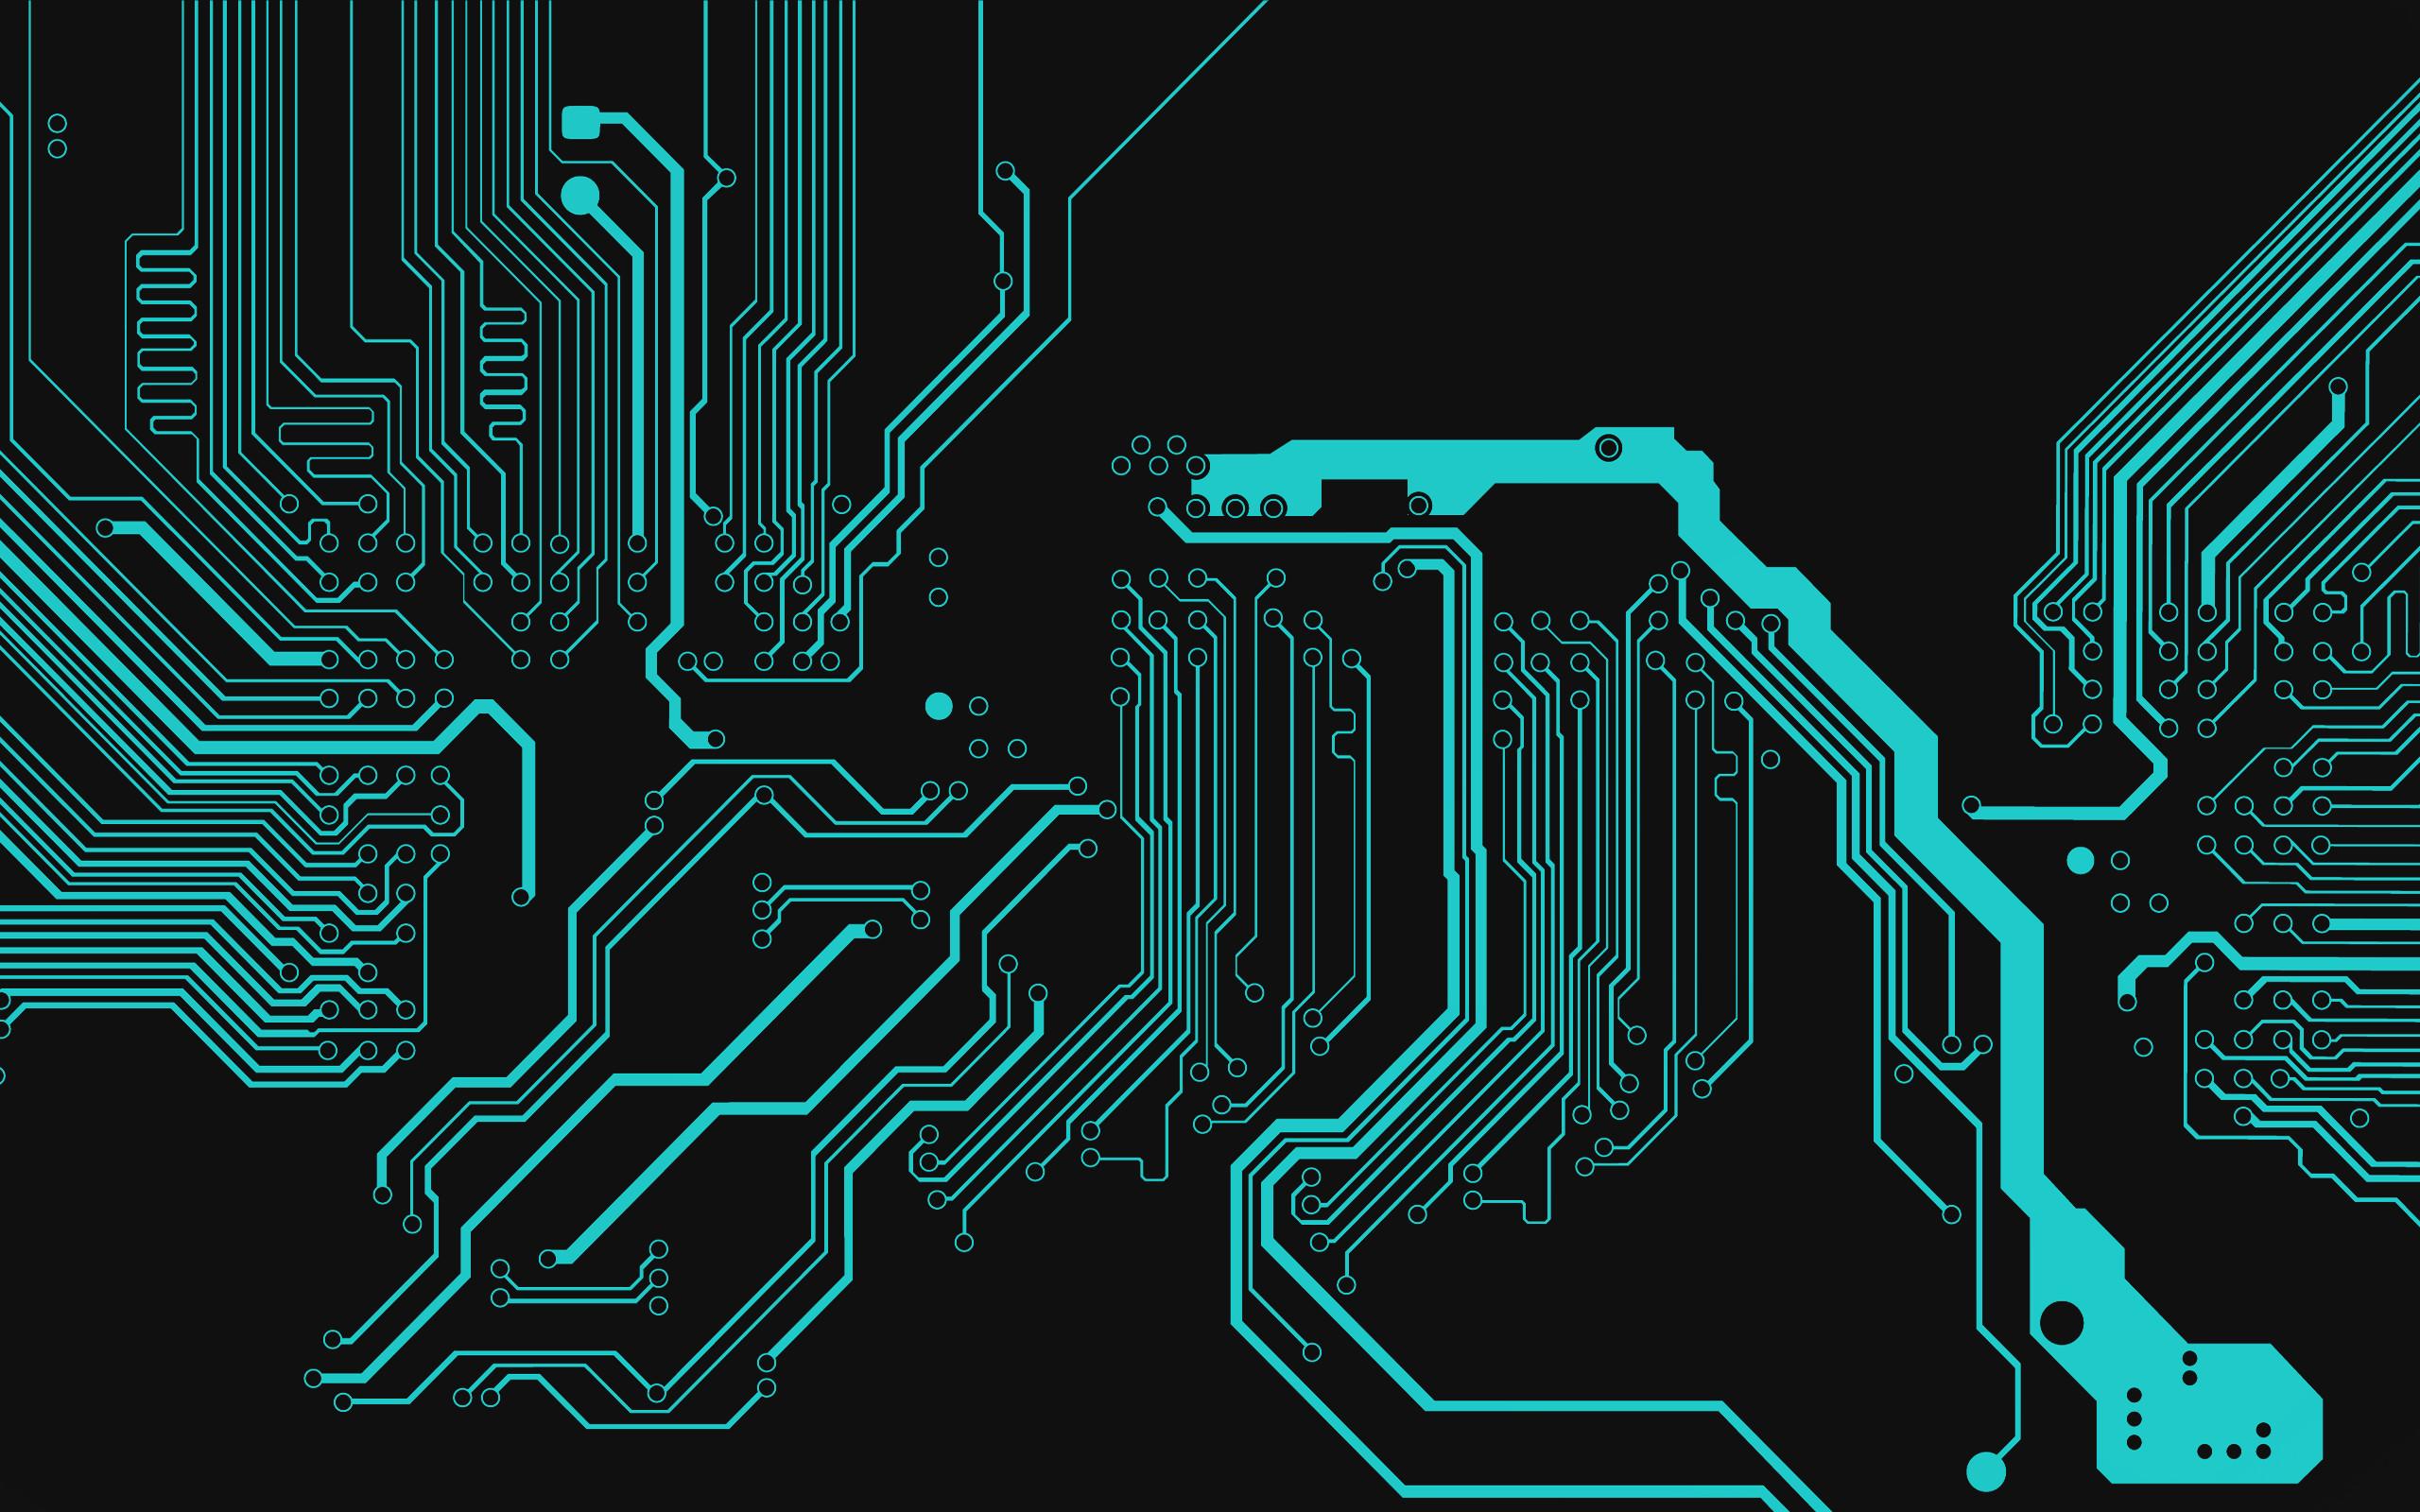 Circuit Wallpaper HD (75+ Images